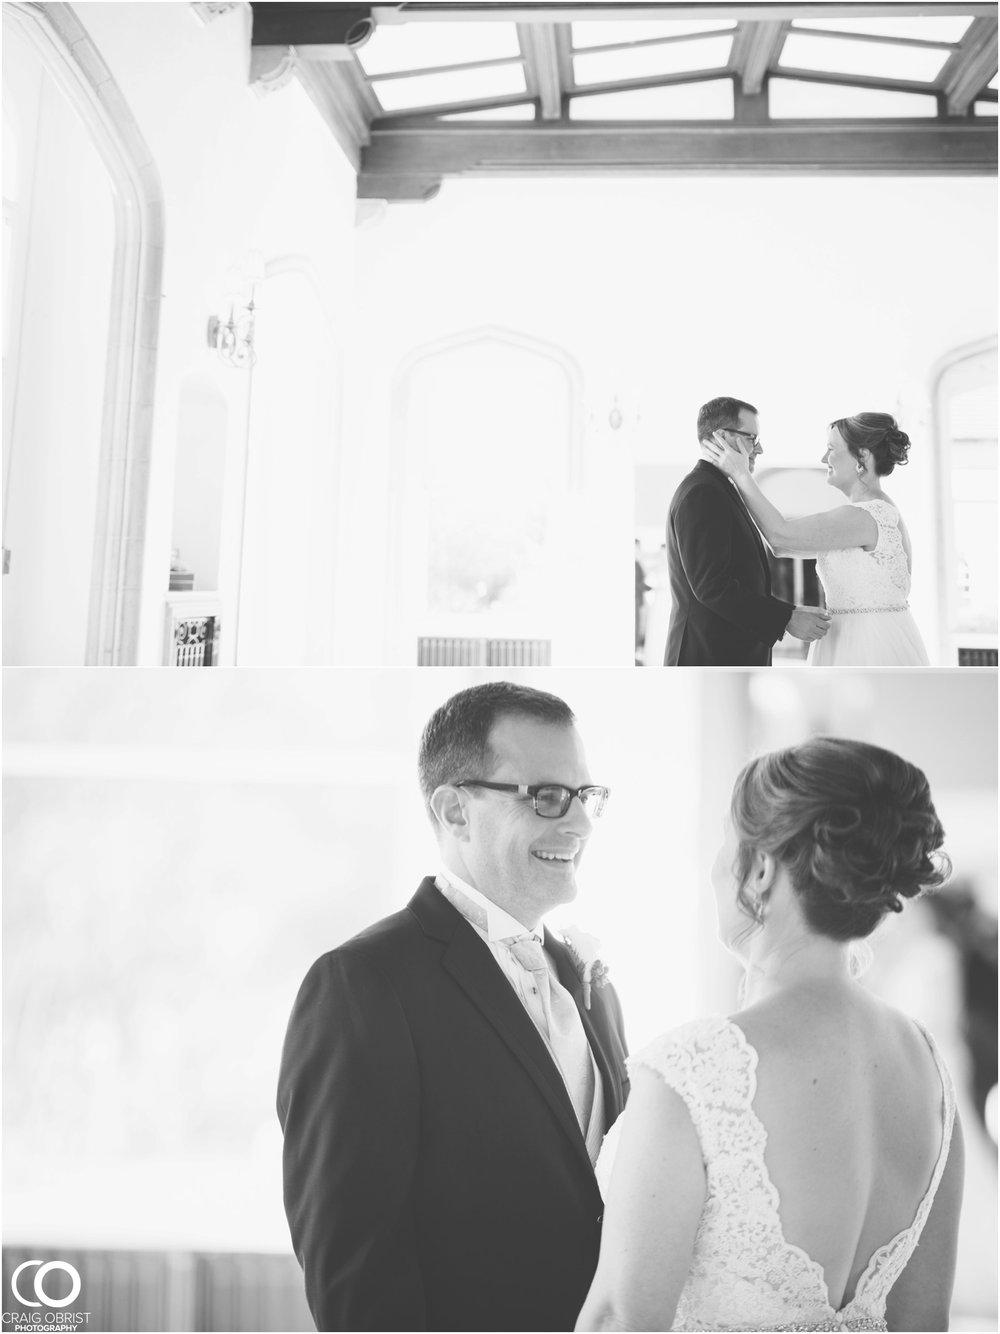 Callanwolde-Fine-Arts-Center Wedding Atlanta Georgia Dec 2017_0028.jpg